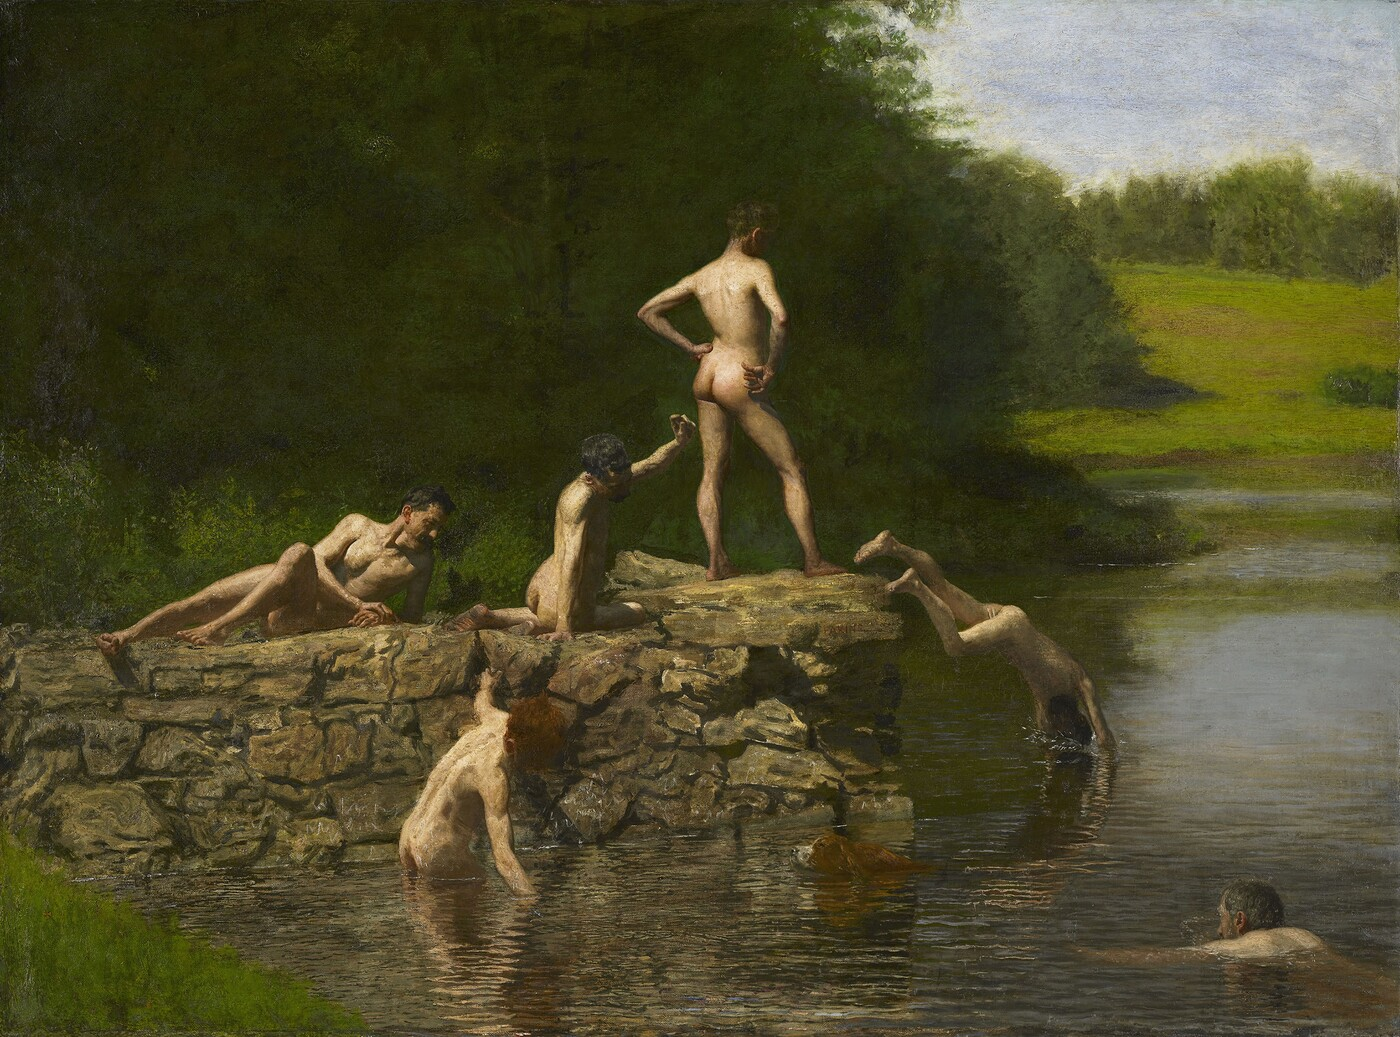 Thomas Eakins (1844–1916), Swimming, 1885, Oil on canvas